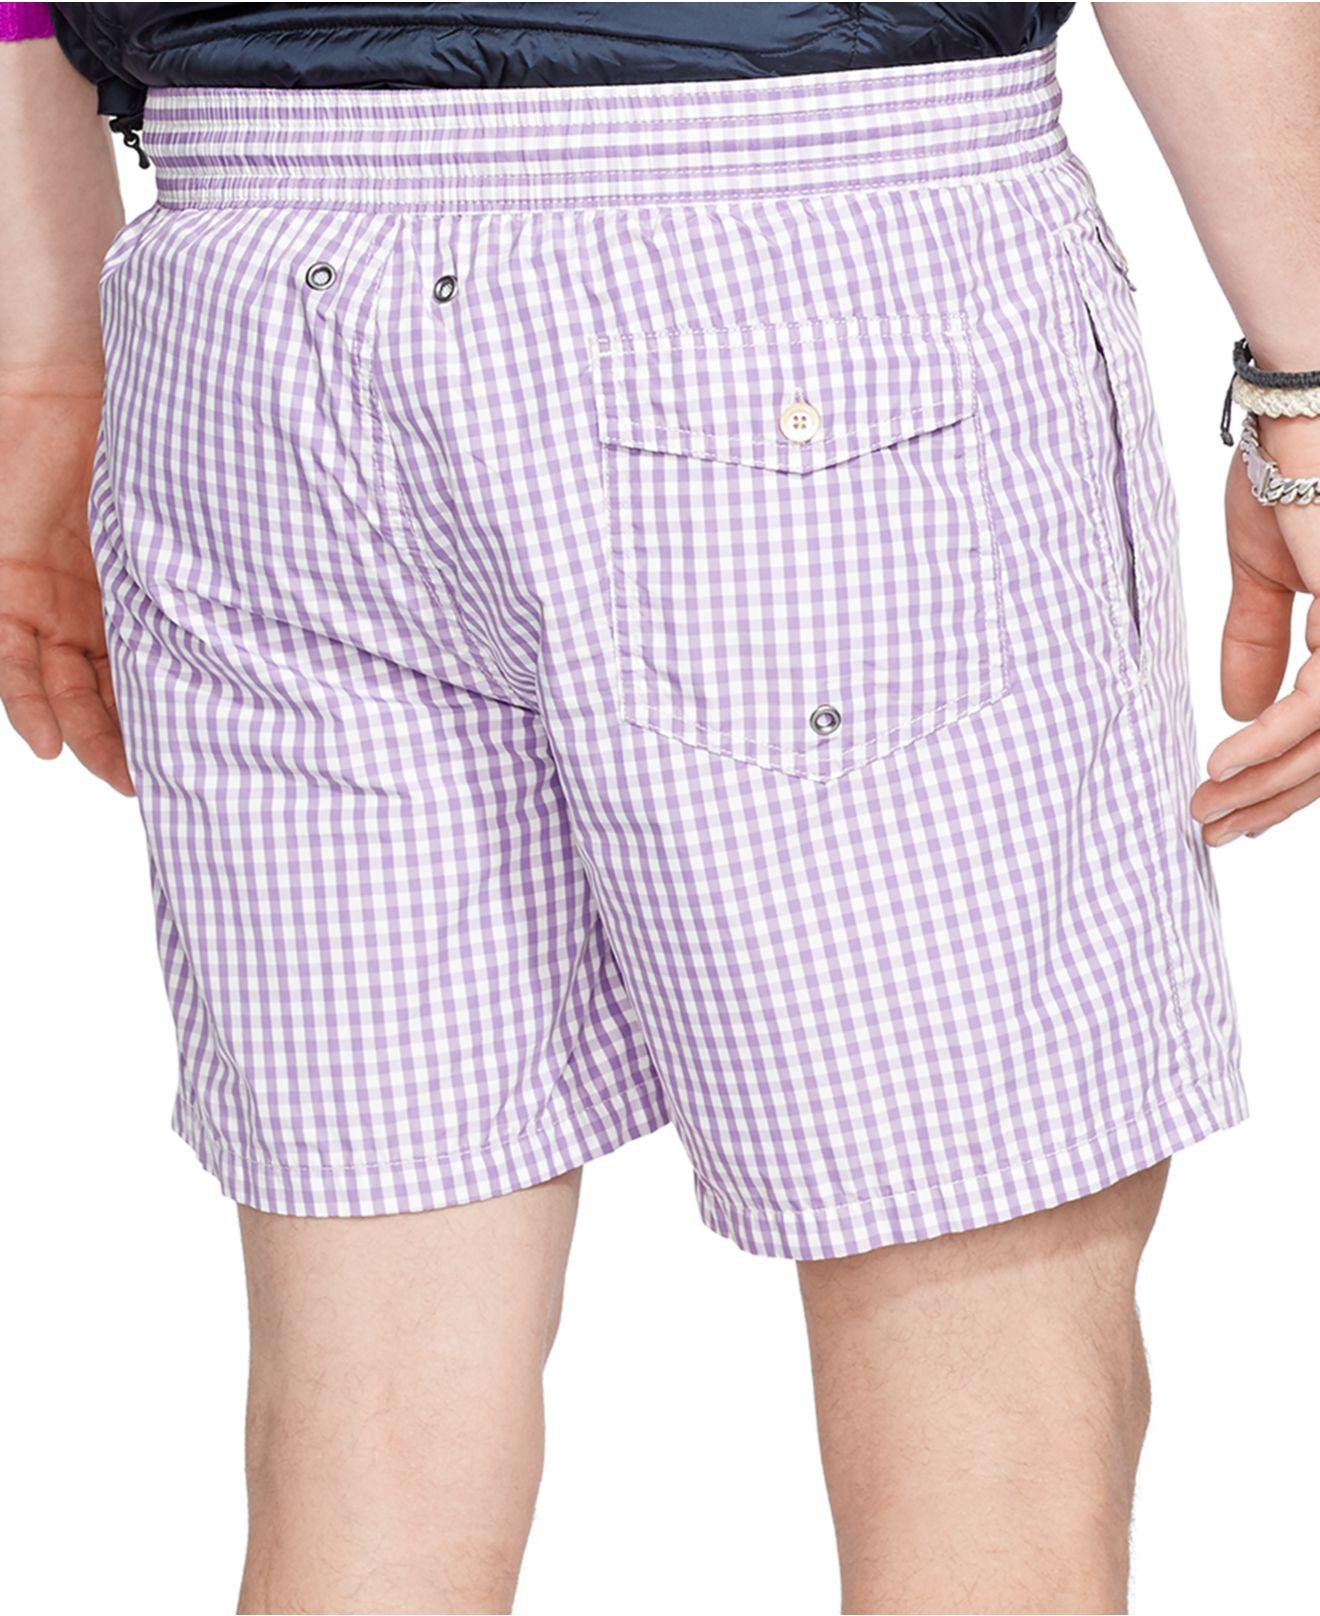 61158a865a ... discount lyst polo ralph lauren traveler gingham swim short in purple  for men f0959 26bf6